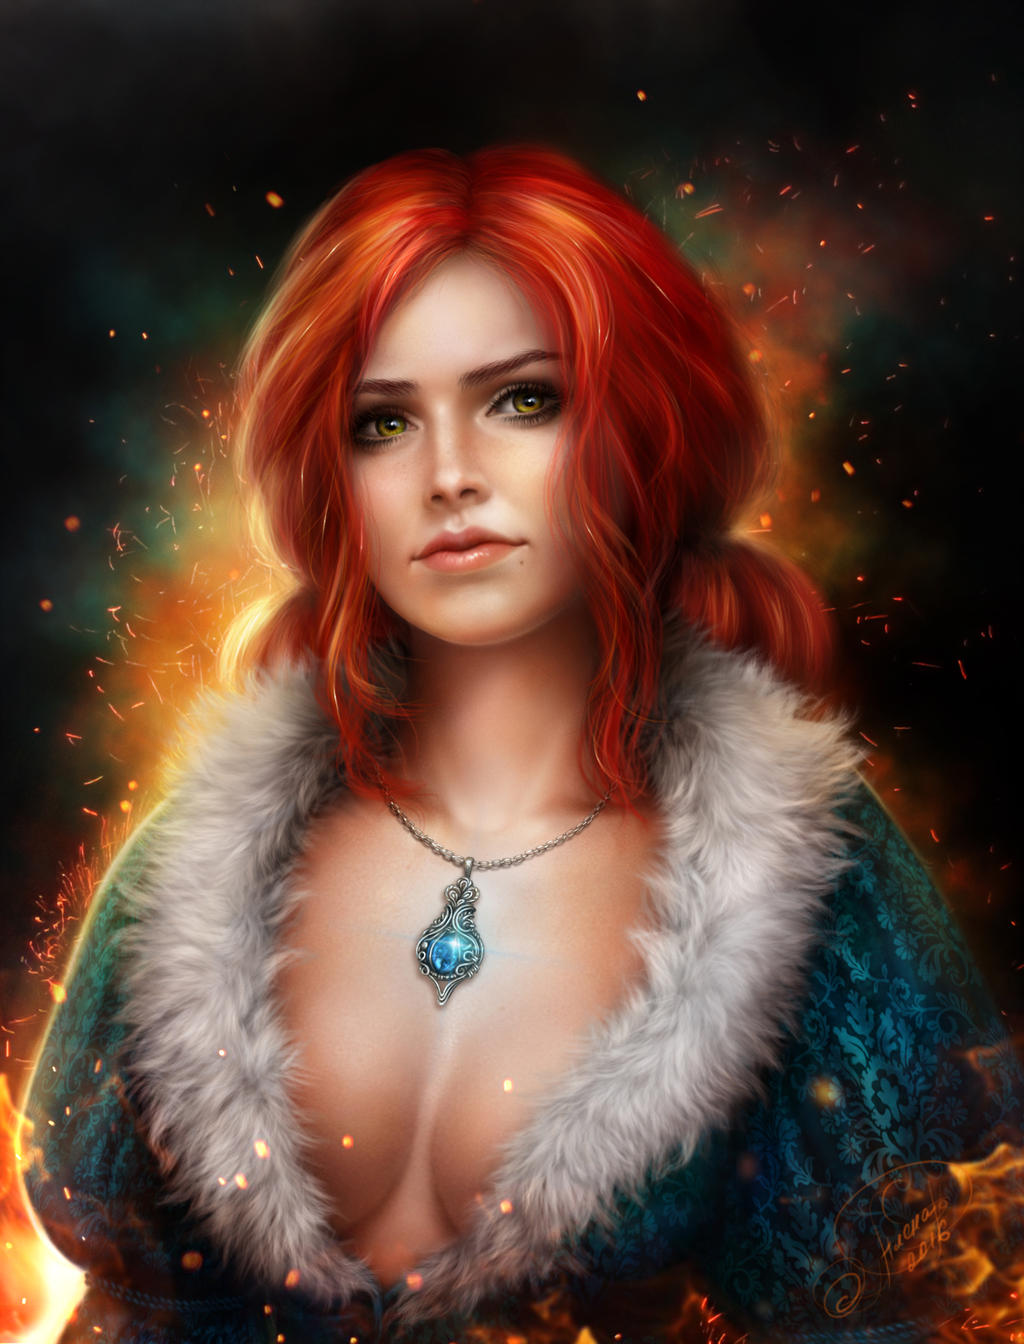 Трисс Меригольд - Witcher 3: Wild Hunt, the